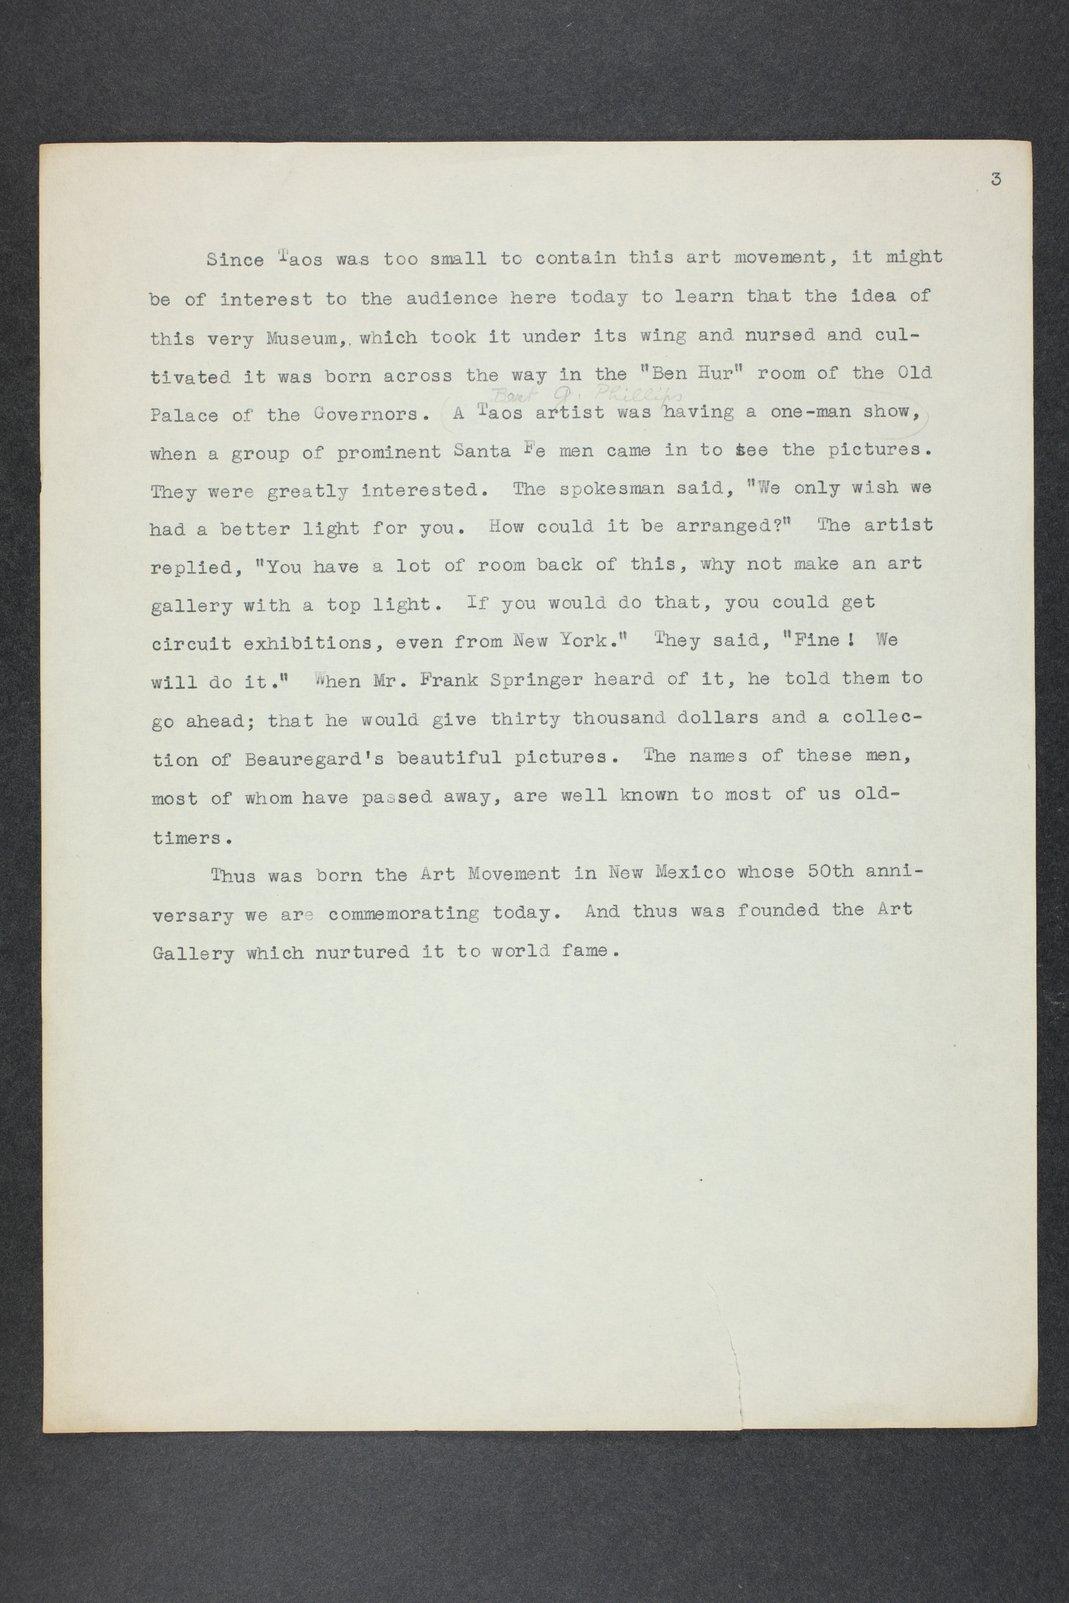 Robert Taft correspondence related to frontier artists, Blumenshein - Cary - 10